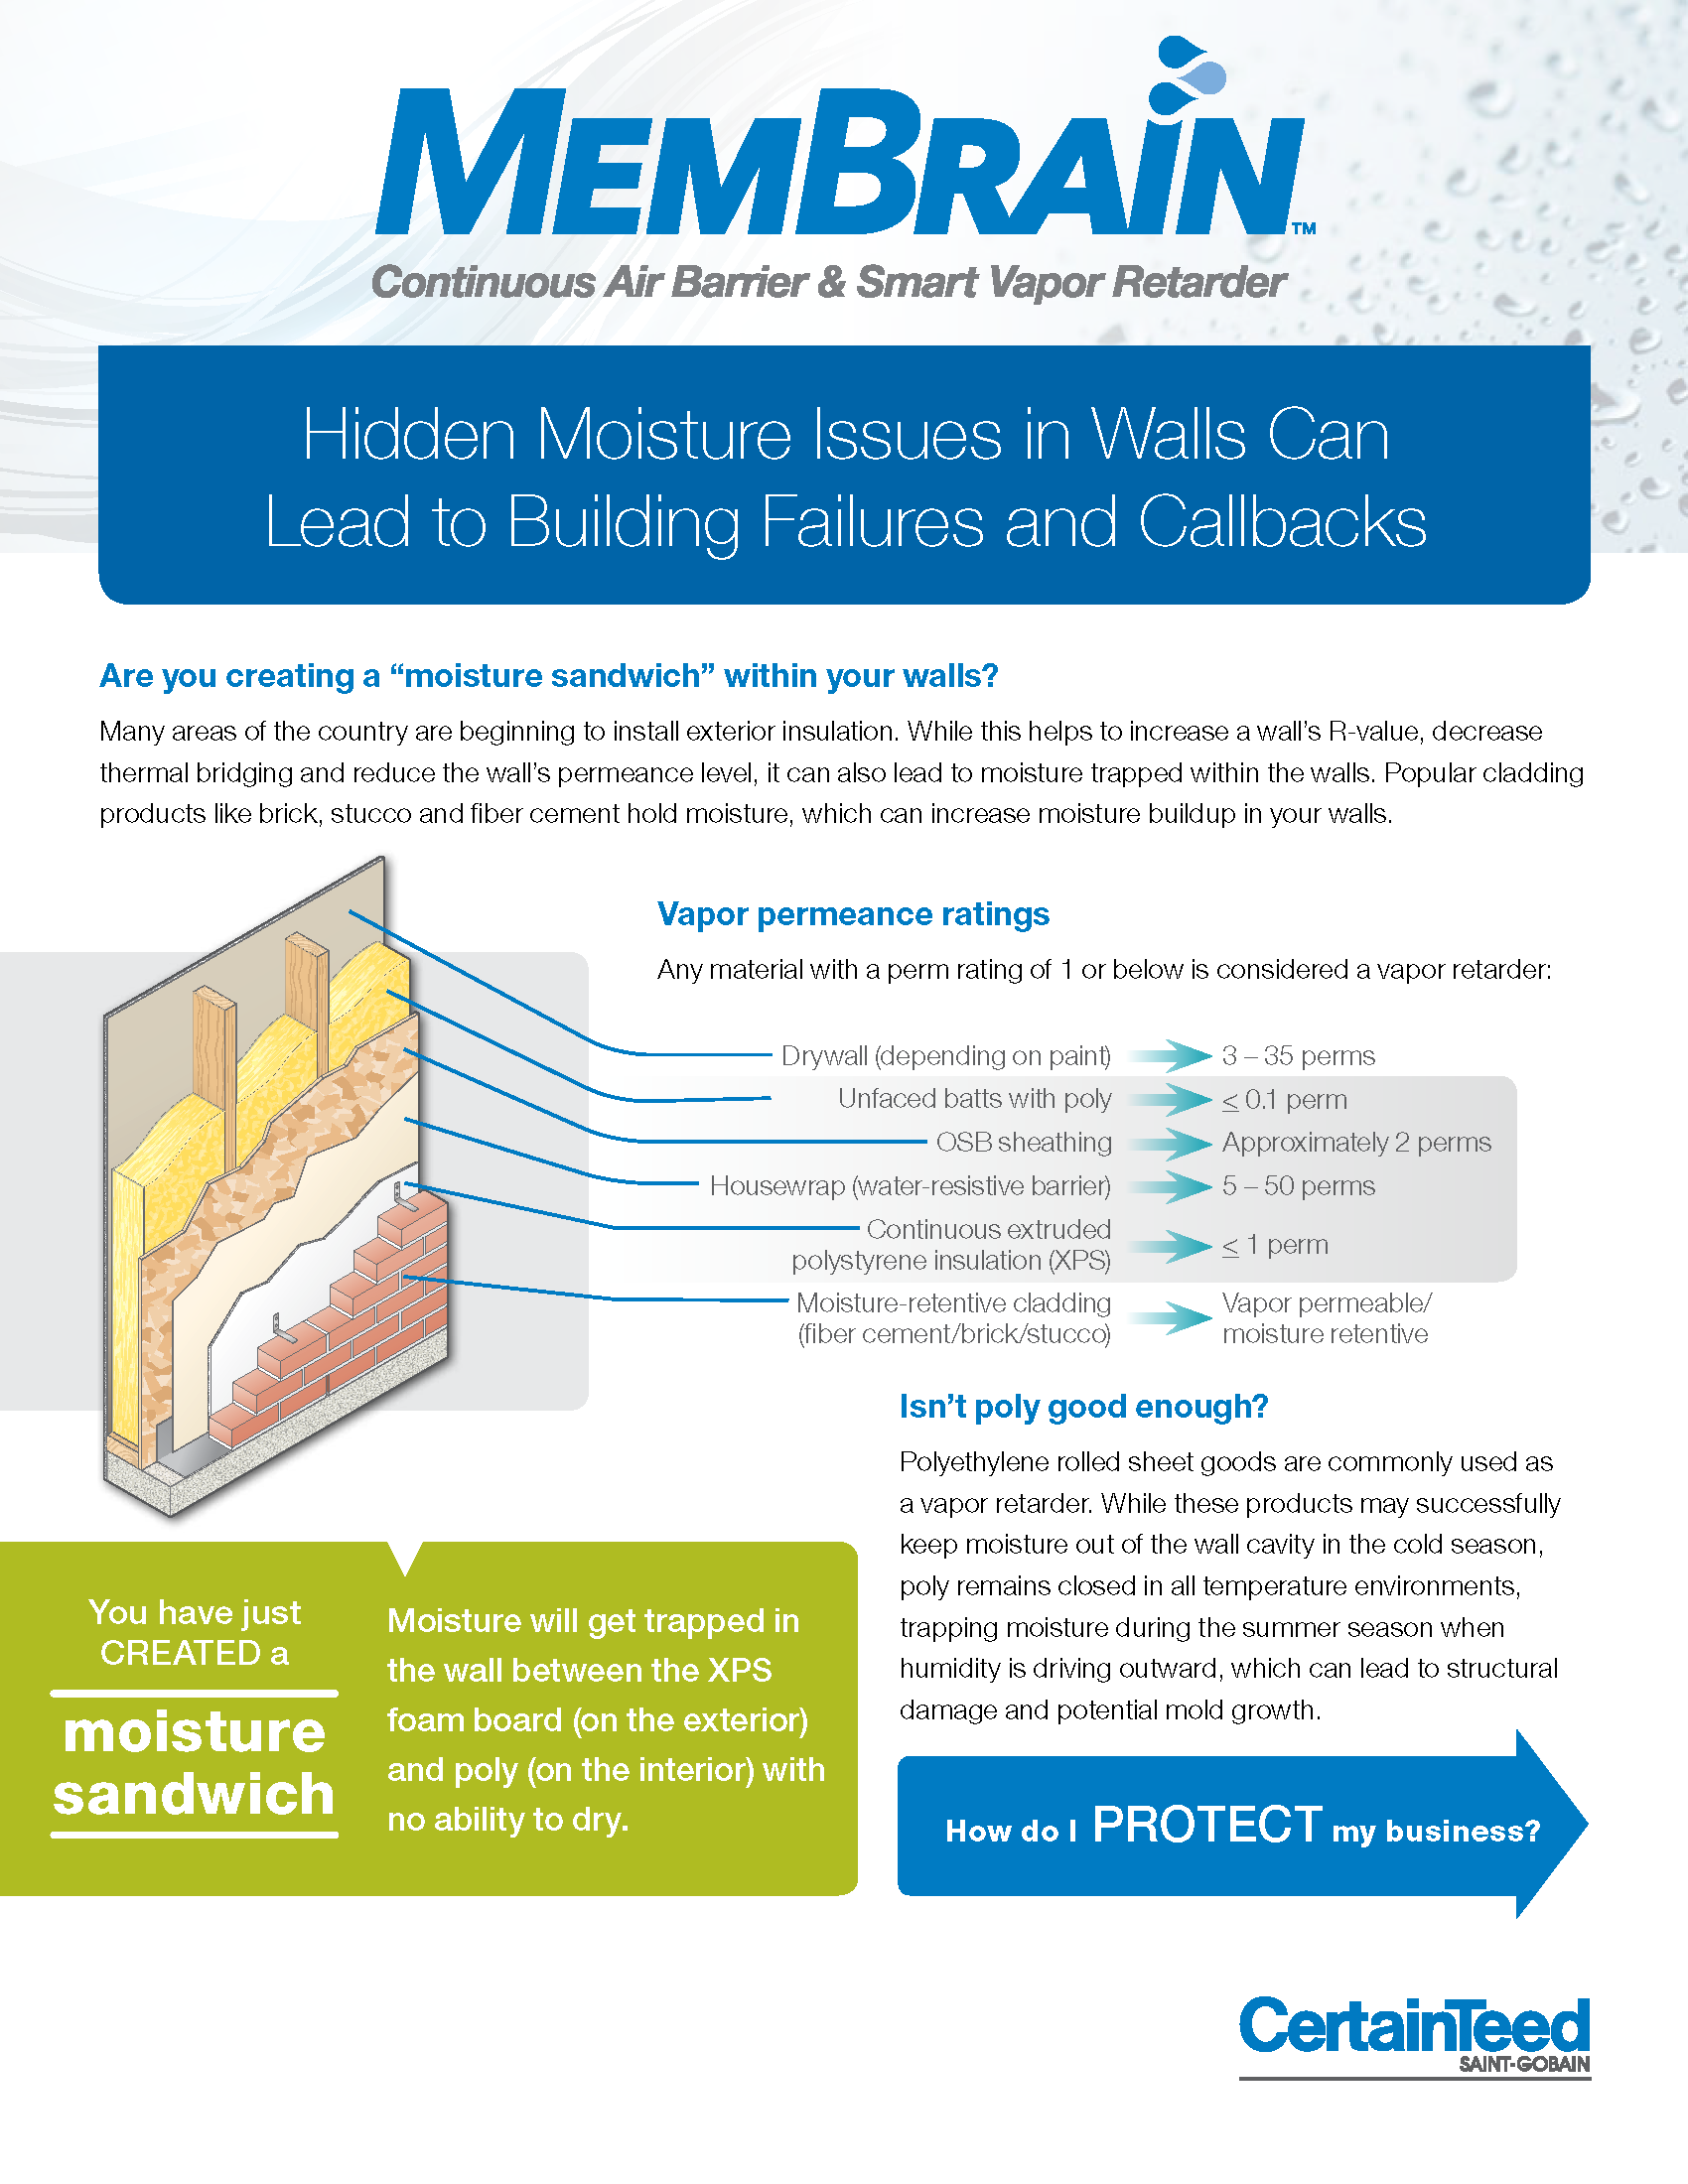 Membrain Mold Prevention Insulation Certainteed